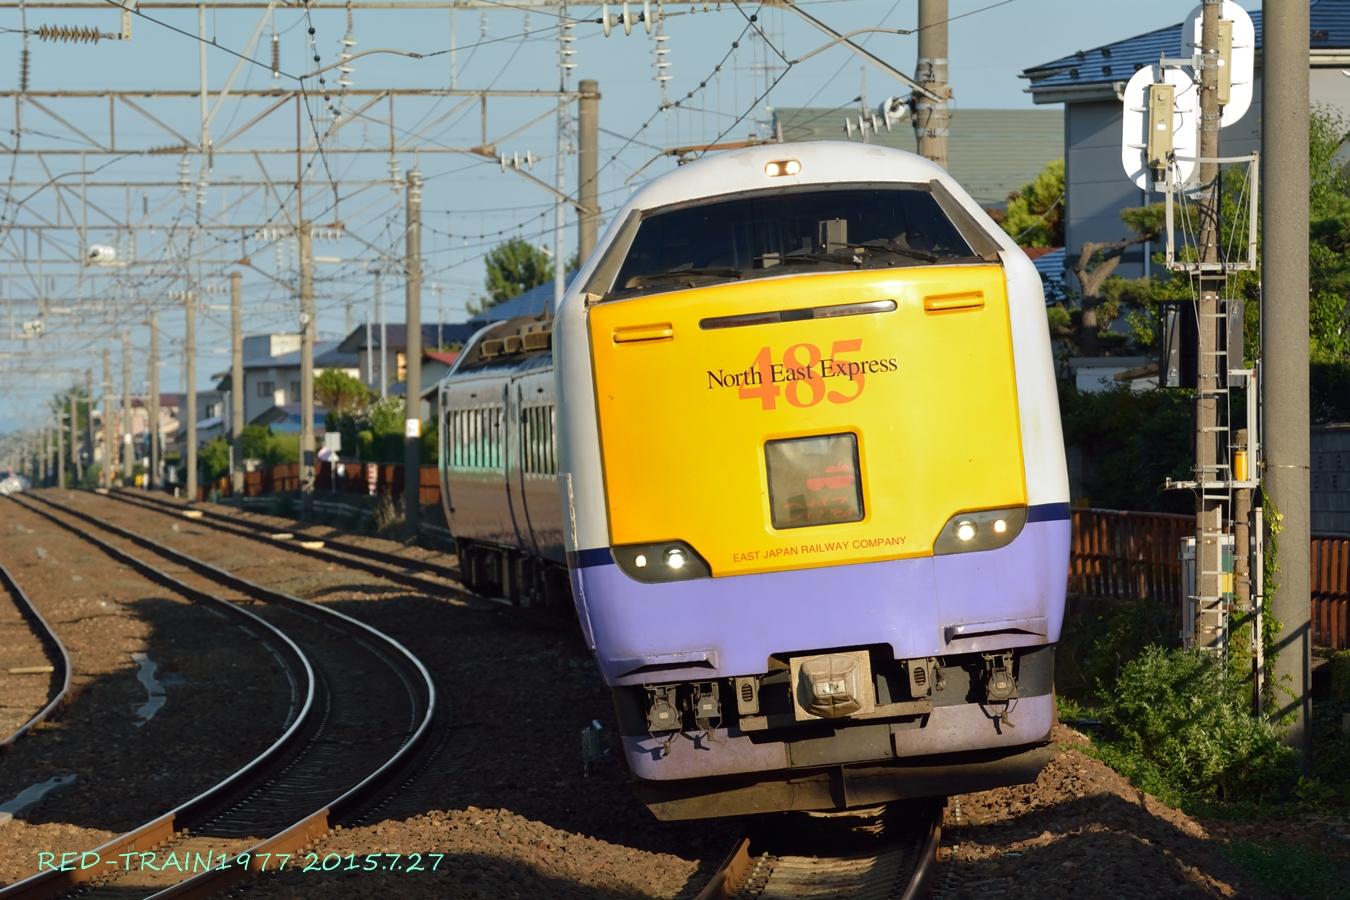 aDSC_1265.jpg